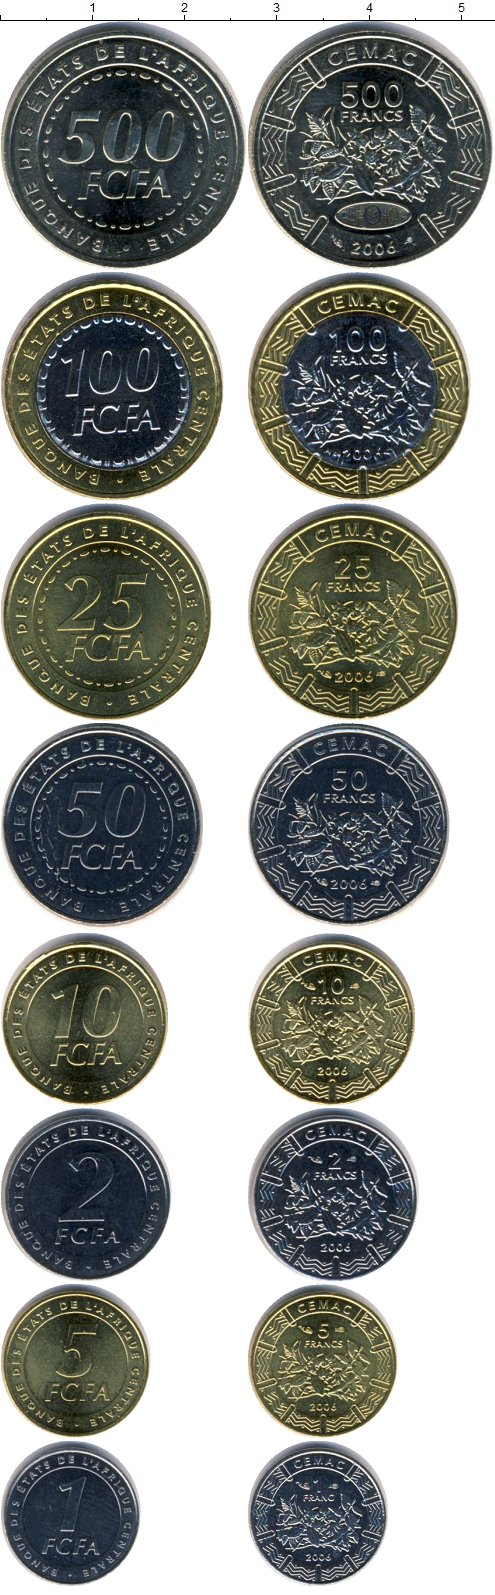 Картинка Наборы монет КФА КФА 2006  2006